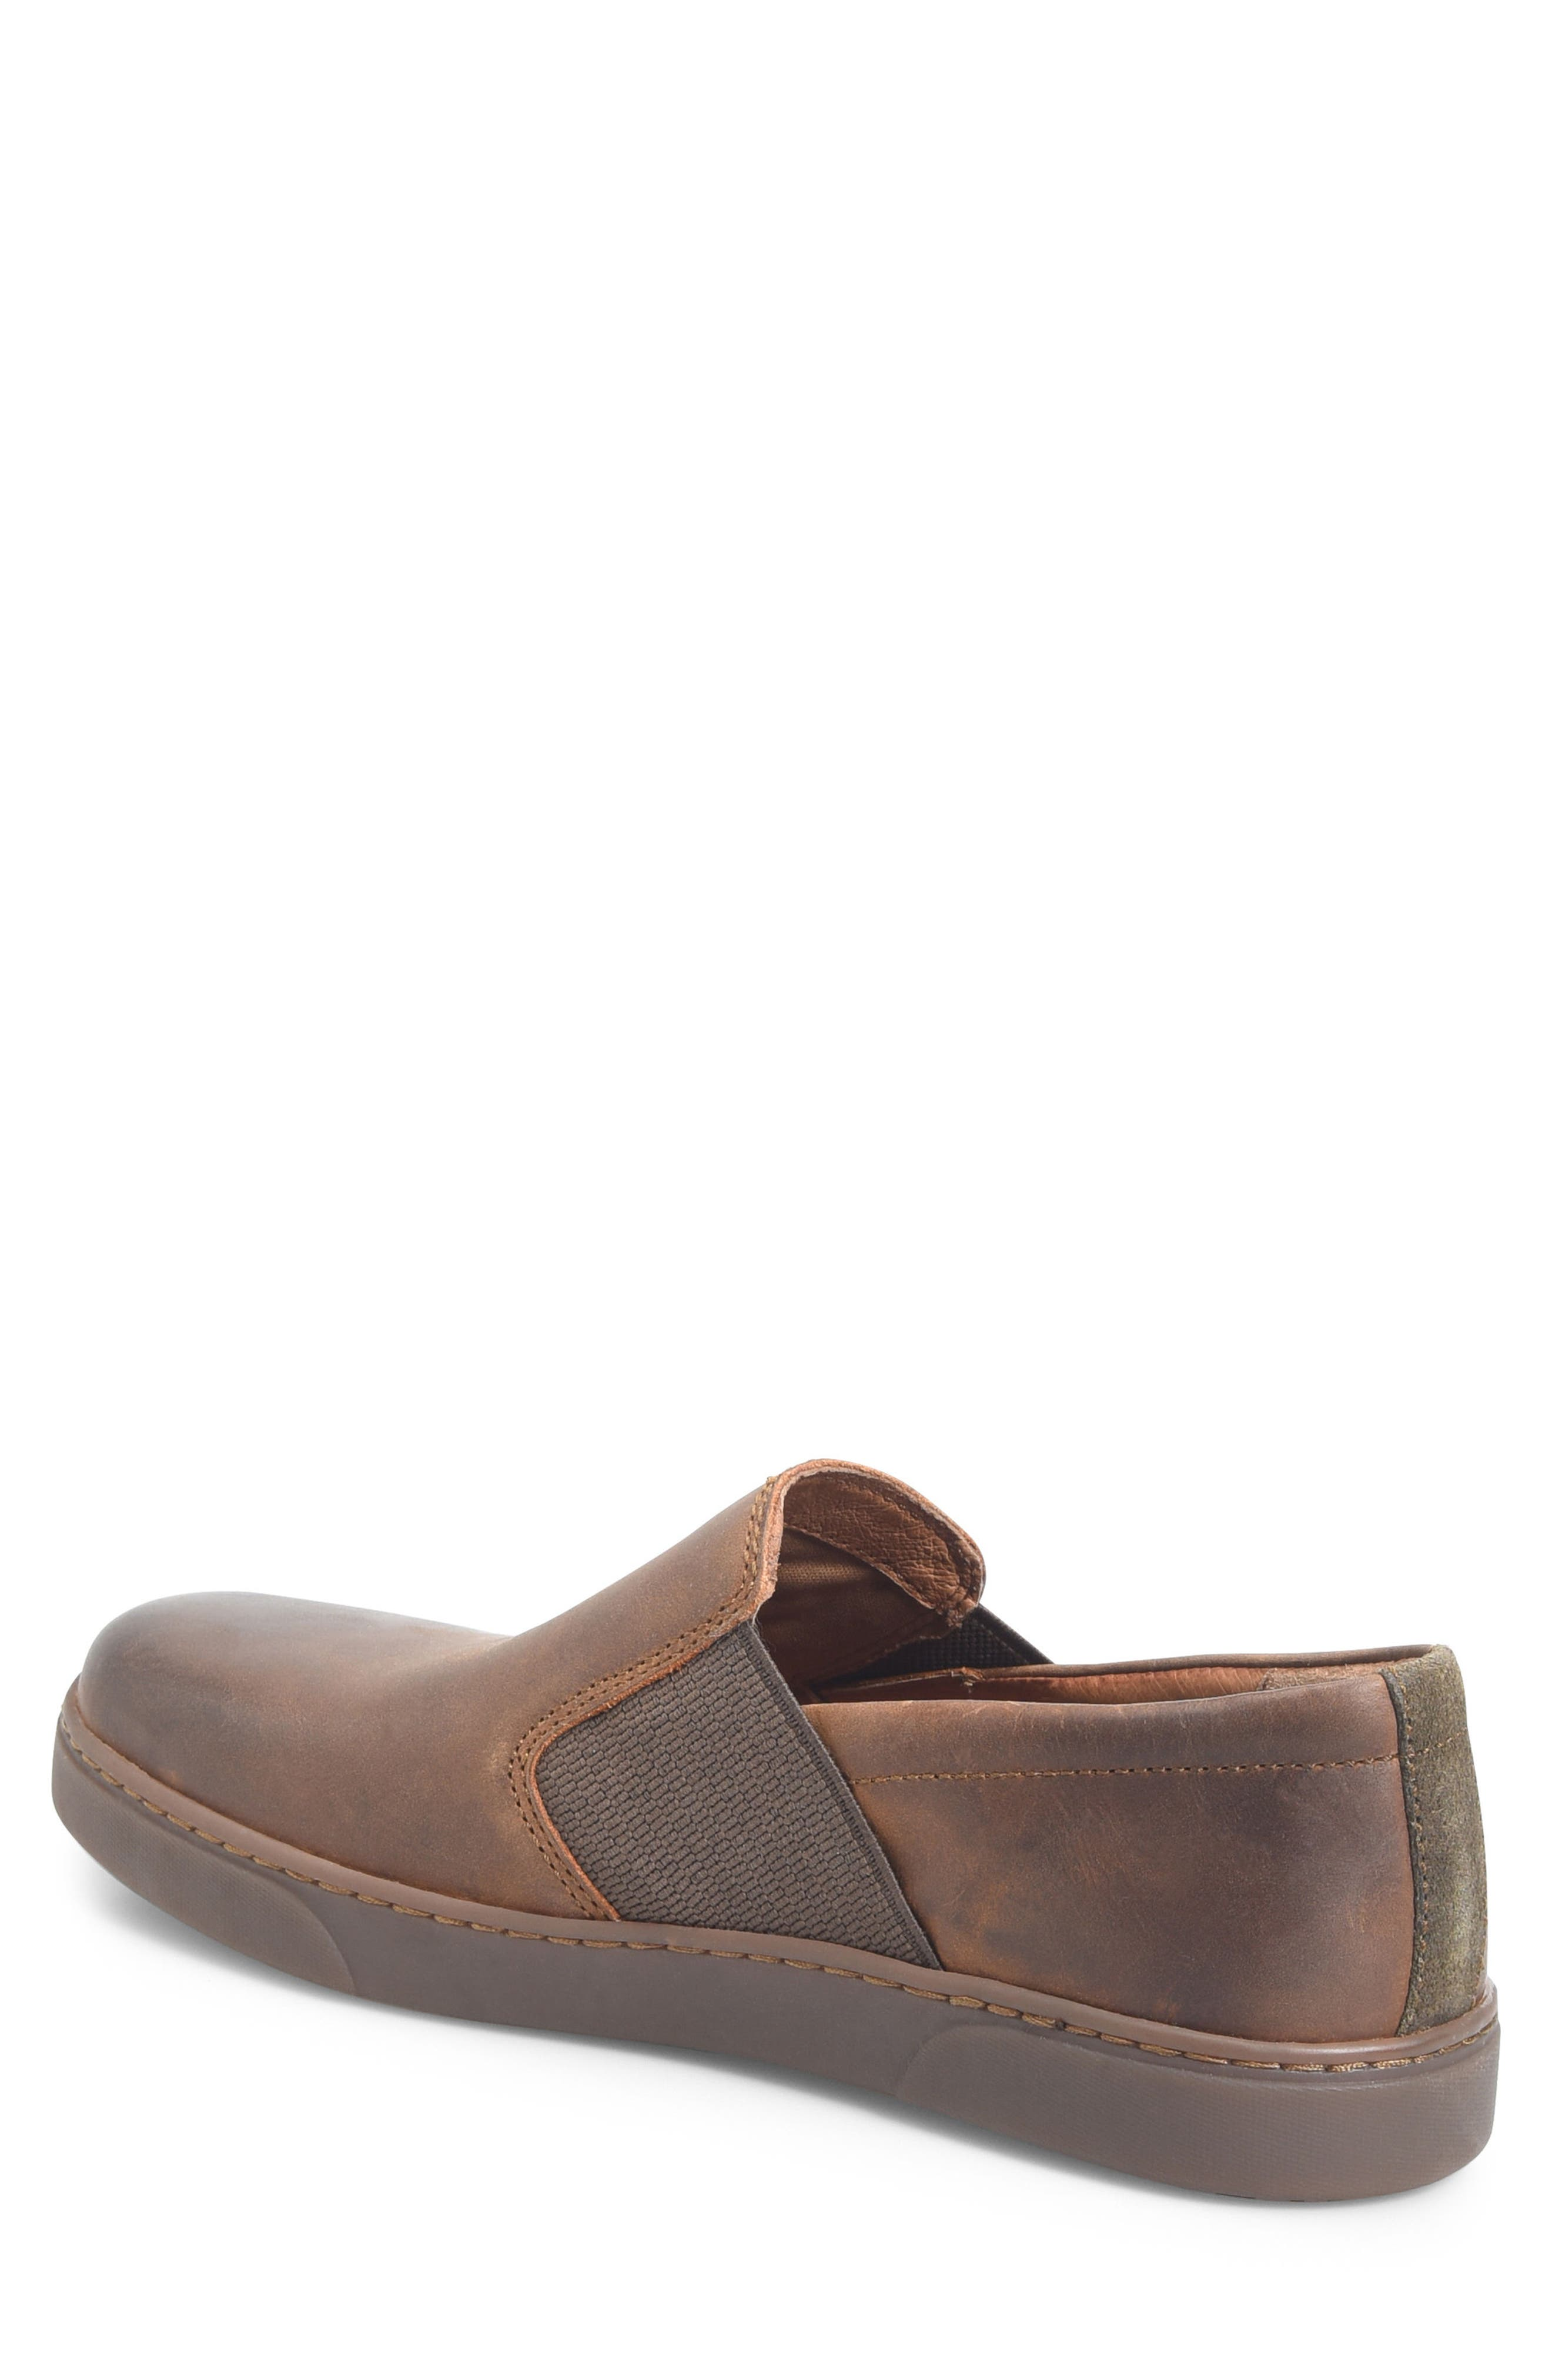 Alternate Image 2  - Børn Belford Slip-On Sneaker (Men)